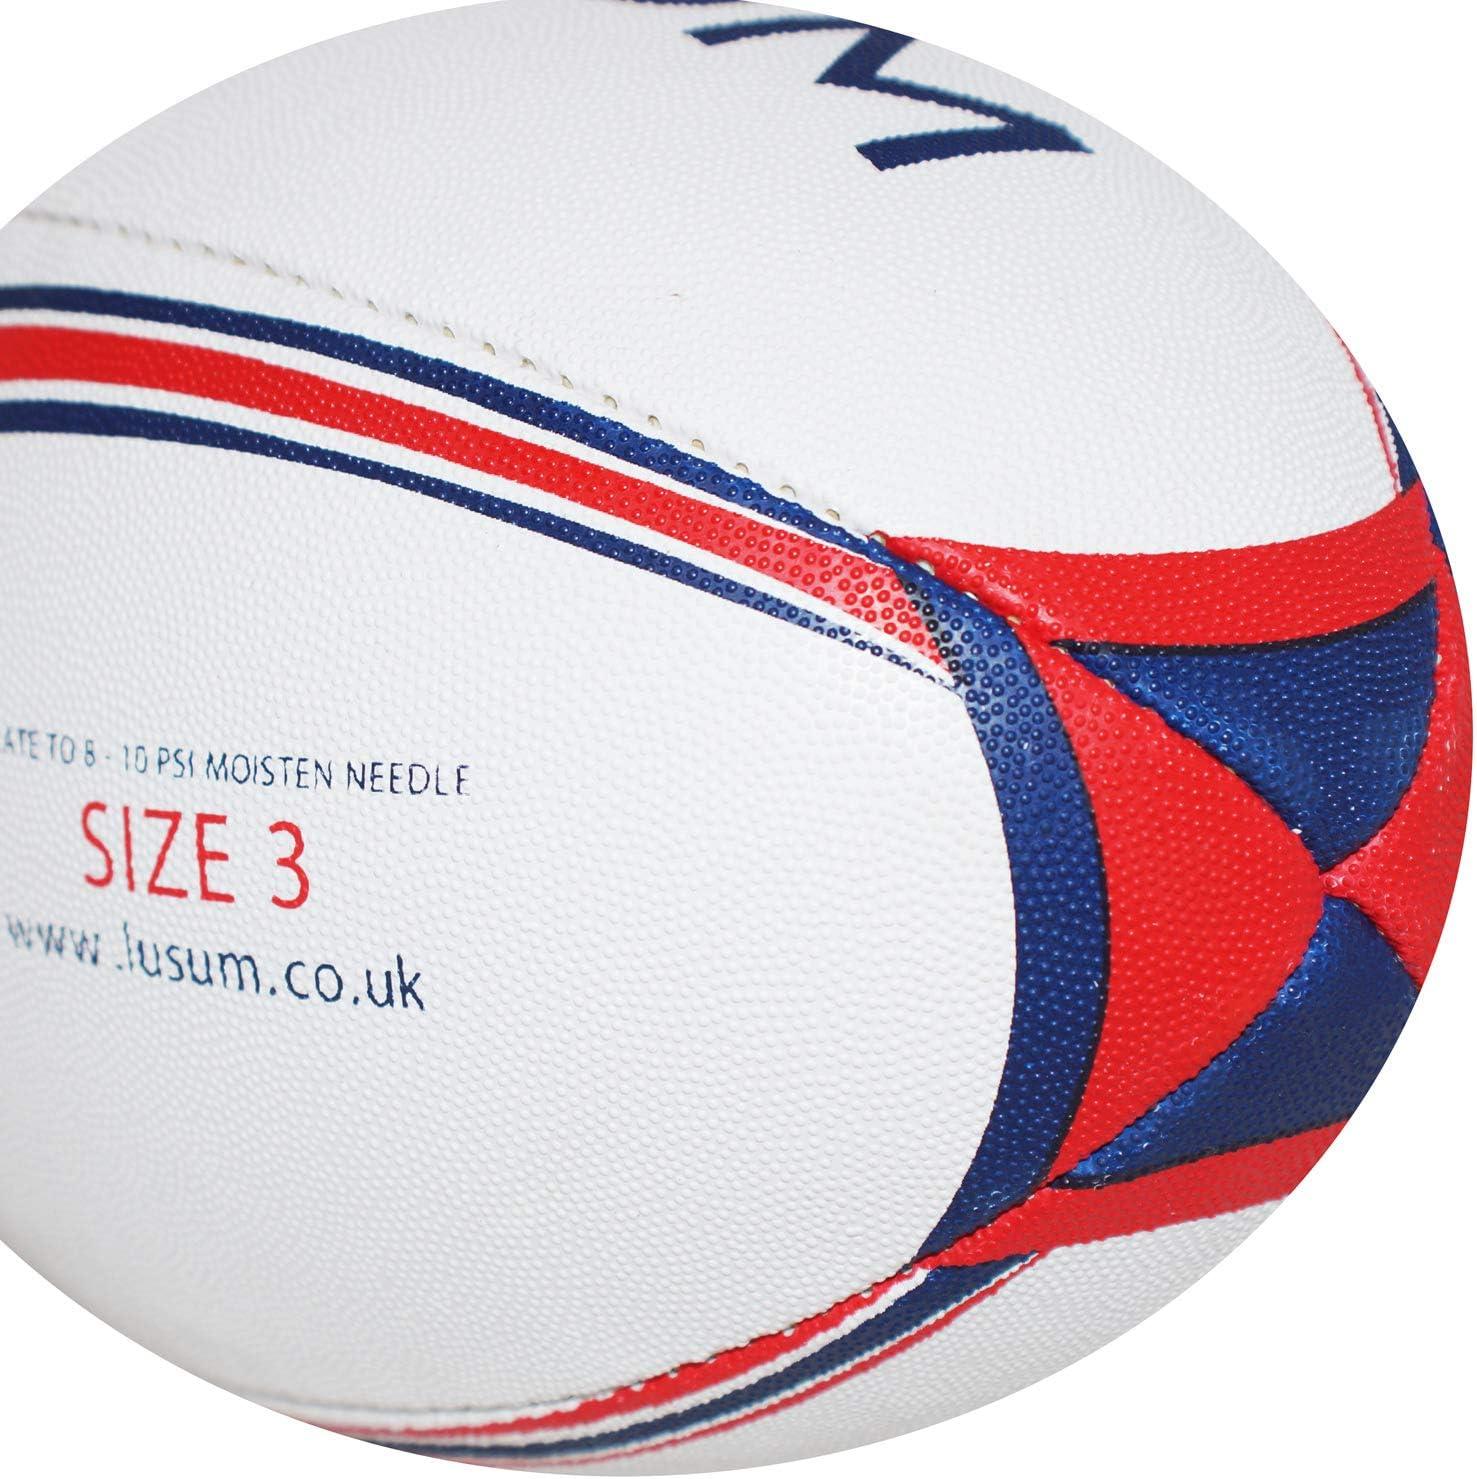 Lusum Munifex Training Rugby Ball